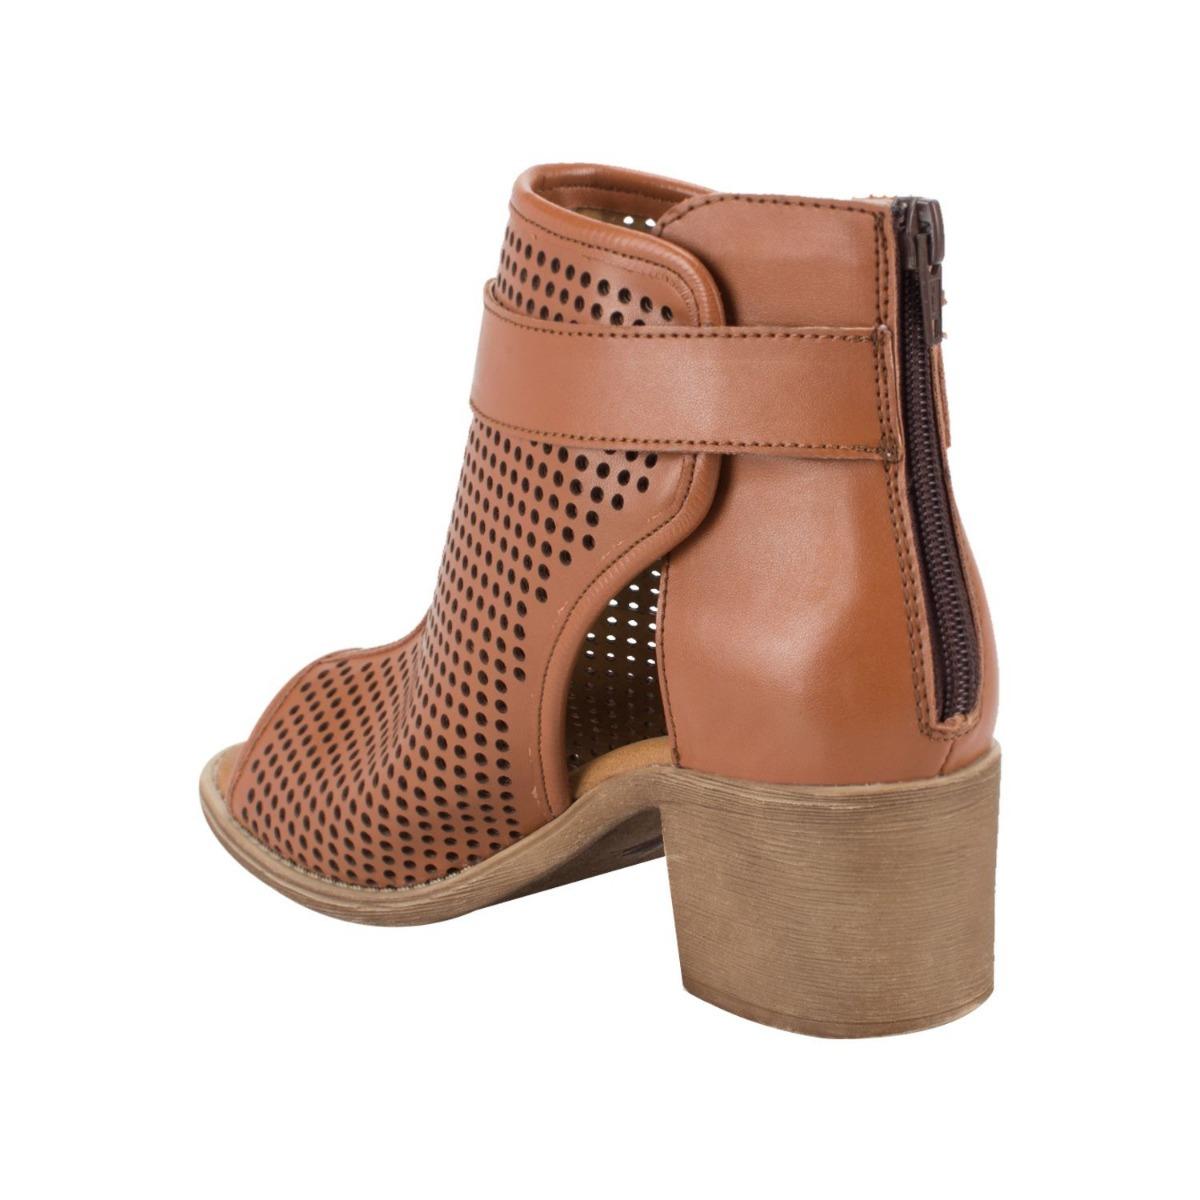 939fd2b6040 Sandalia Botin Vi Line Fashion Camel Sintetico Sn23 A -   529.00 en ...